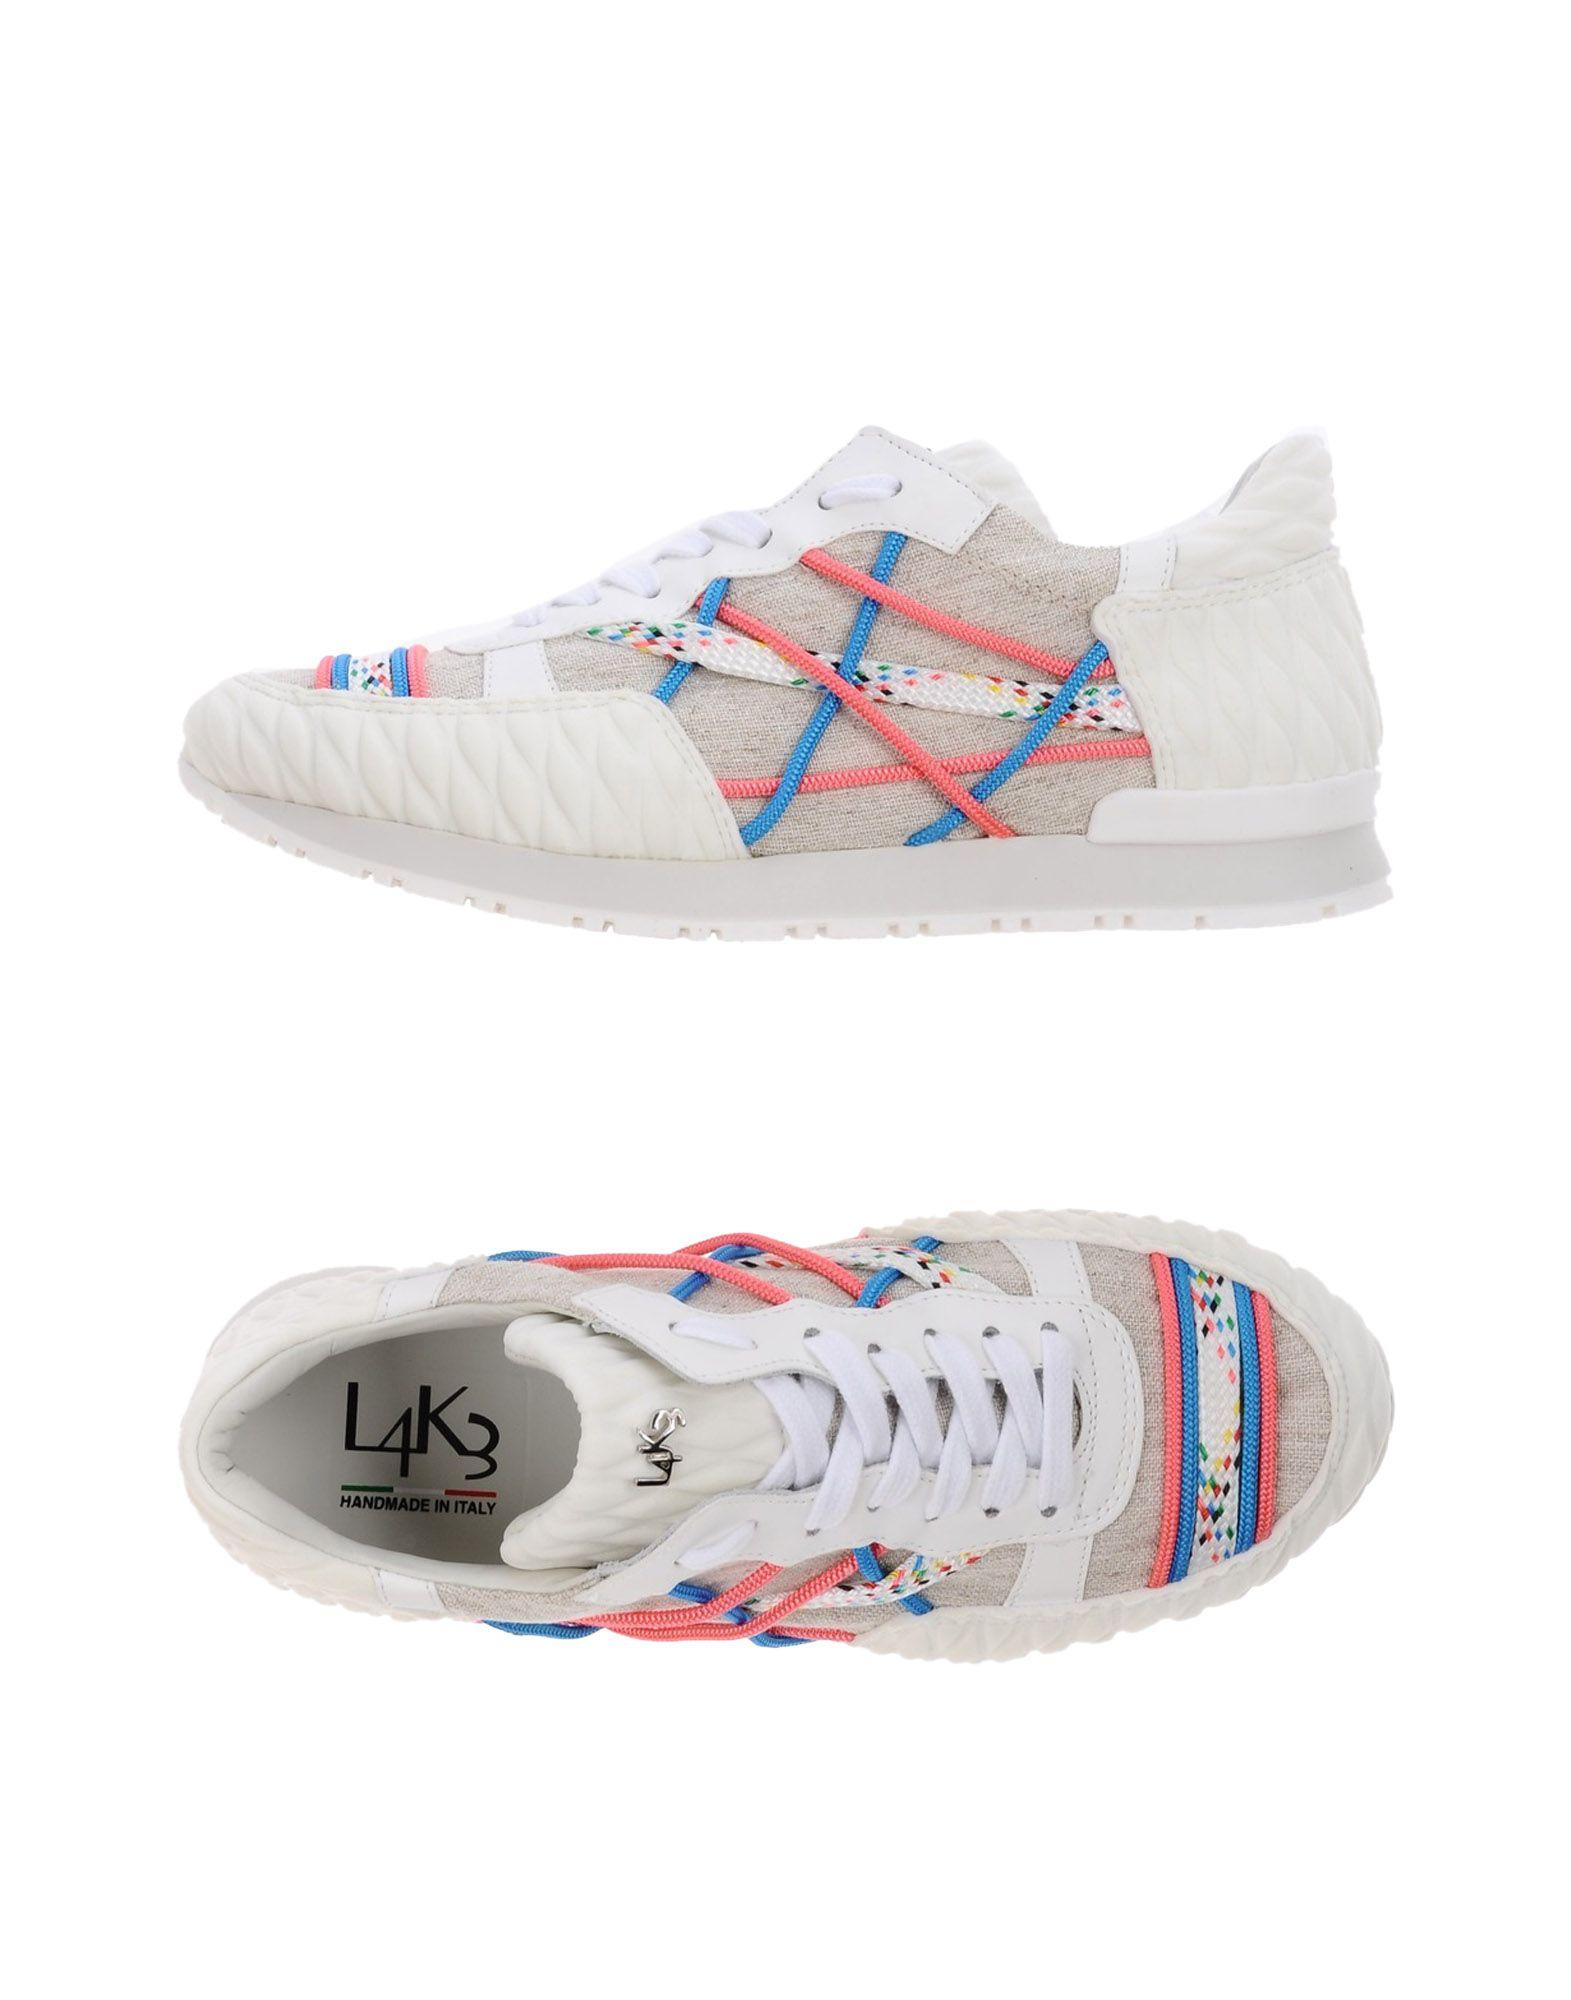 L4k3 Sneakers Damen  11360357HO Gute Qualität beliebte Schuhe